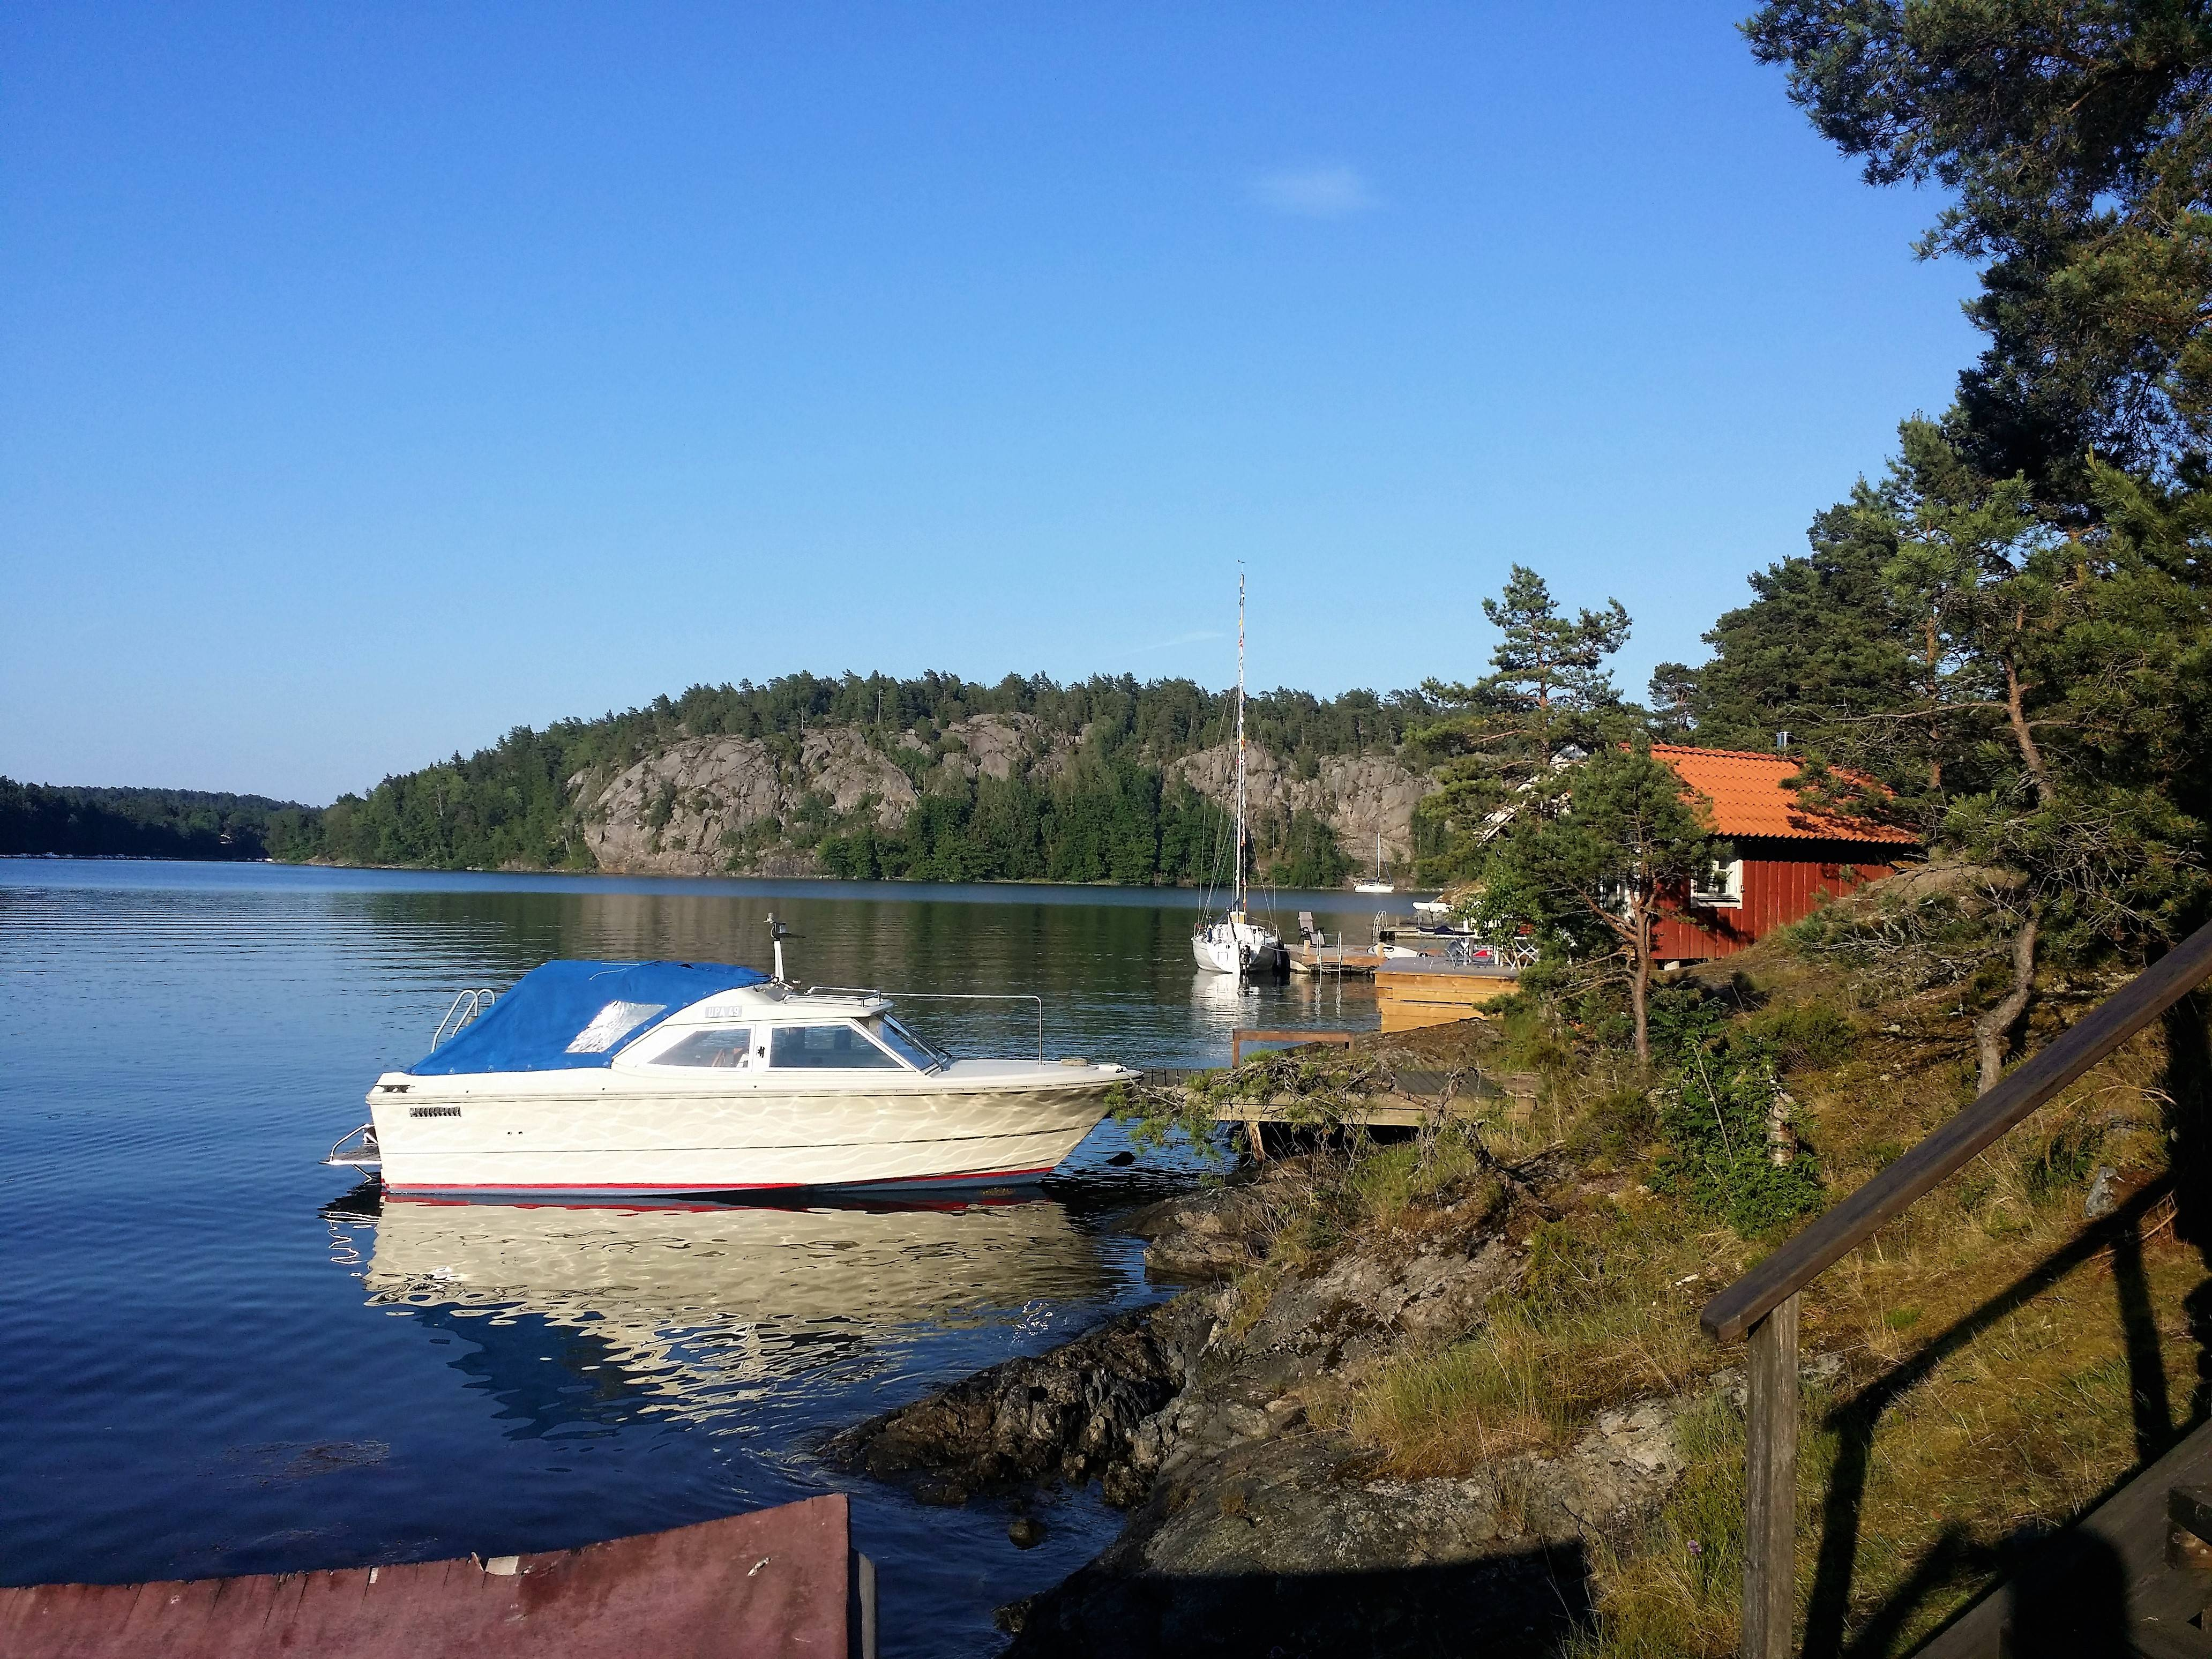 Photo 1: Archipel de Stockholm (Muskö)